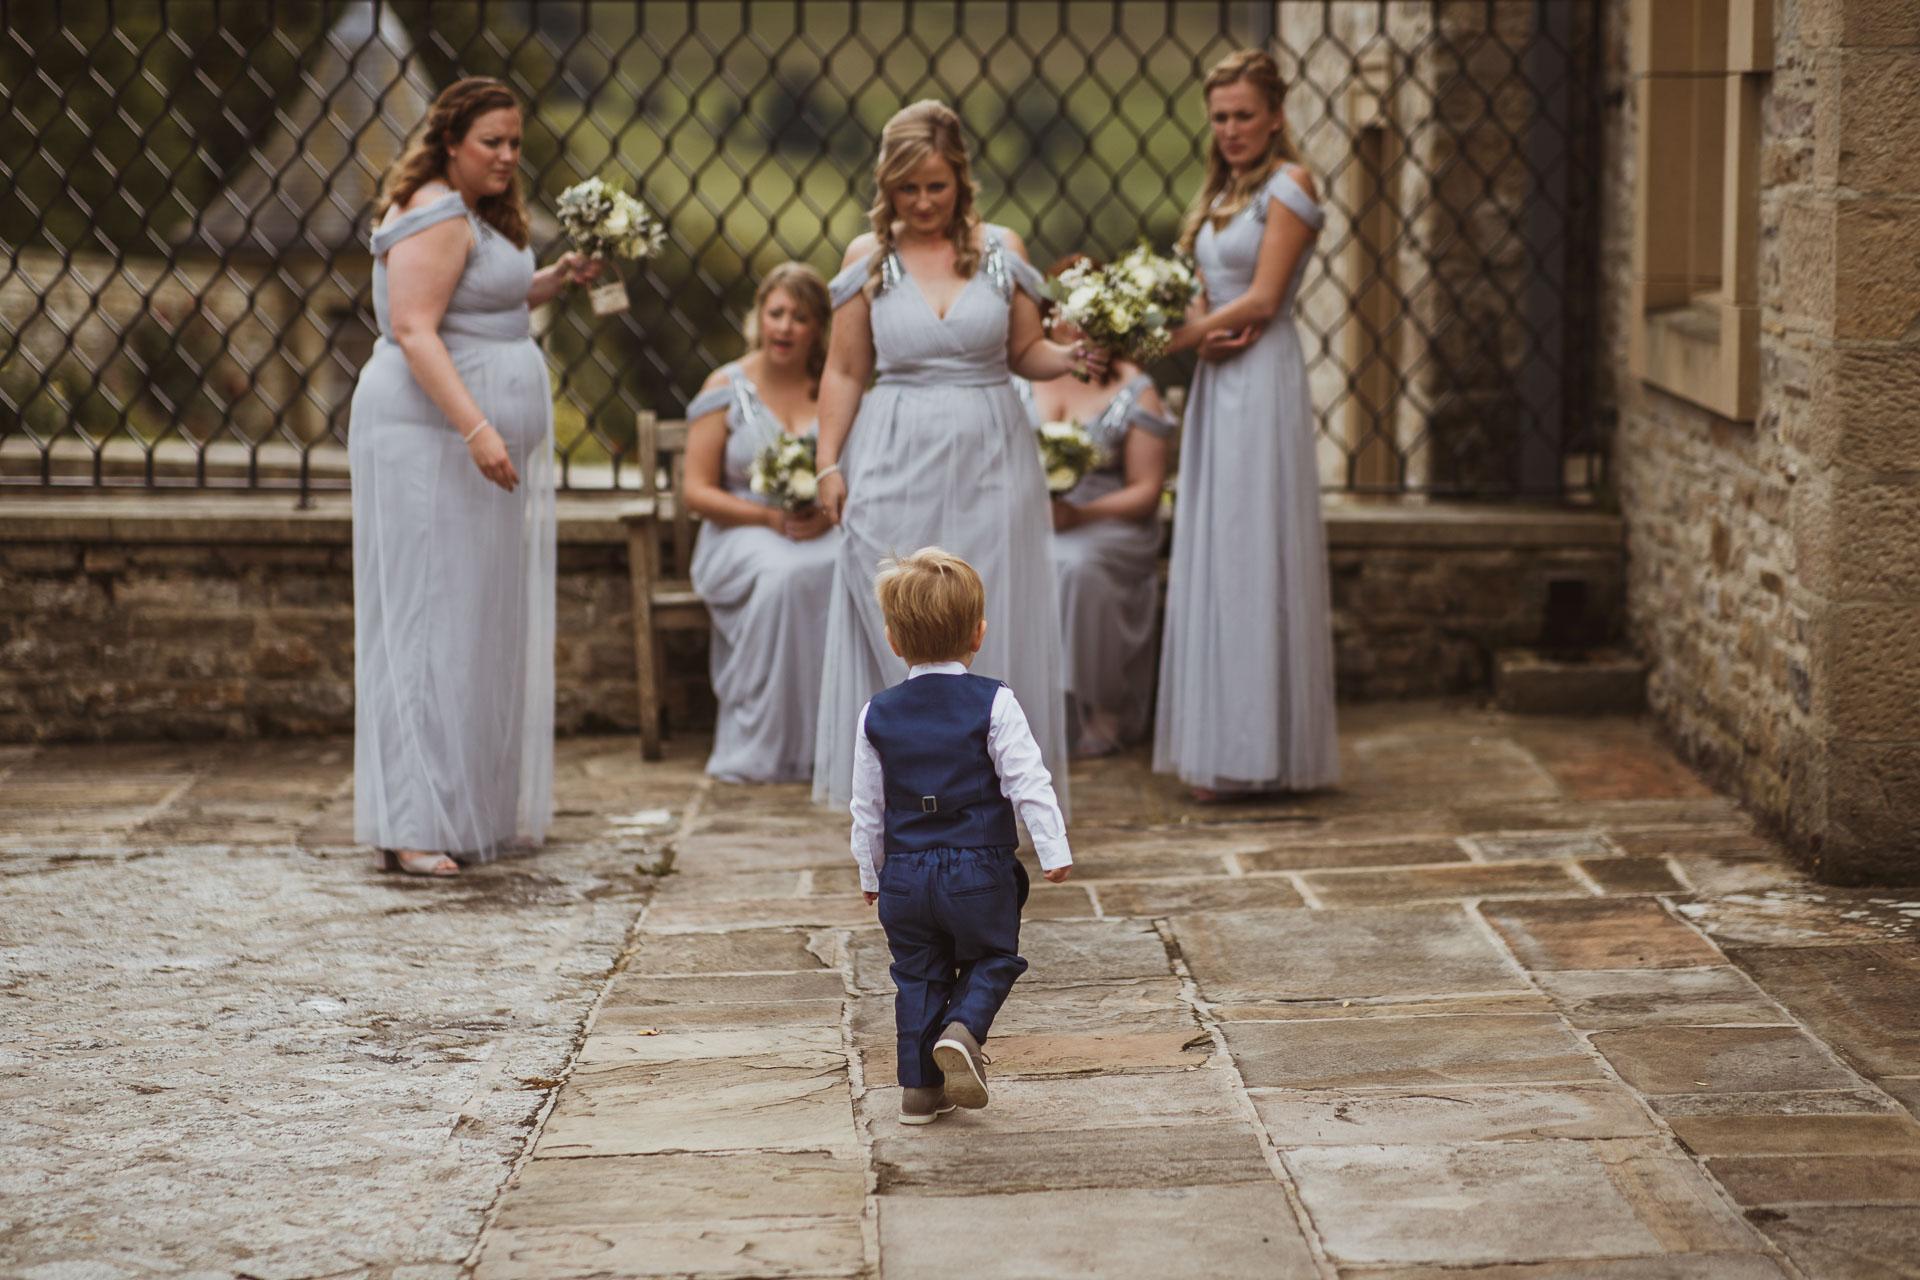 forbidden_corner_tupgill_estate_wedding_photographer-65.jpg